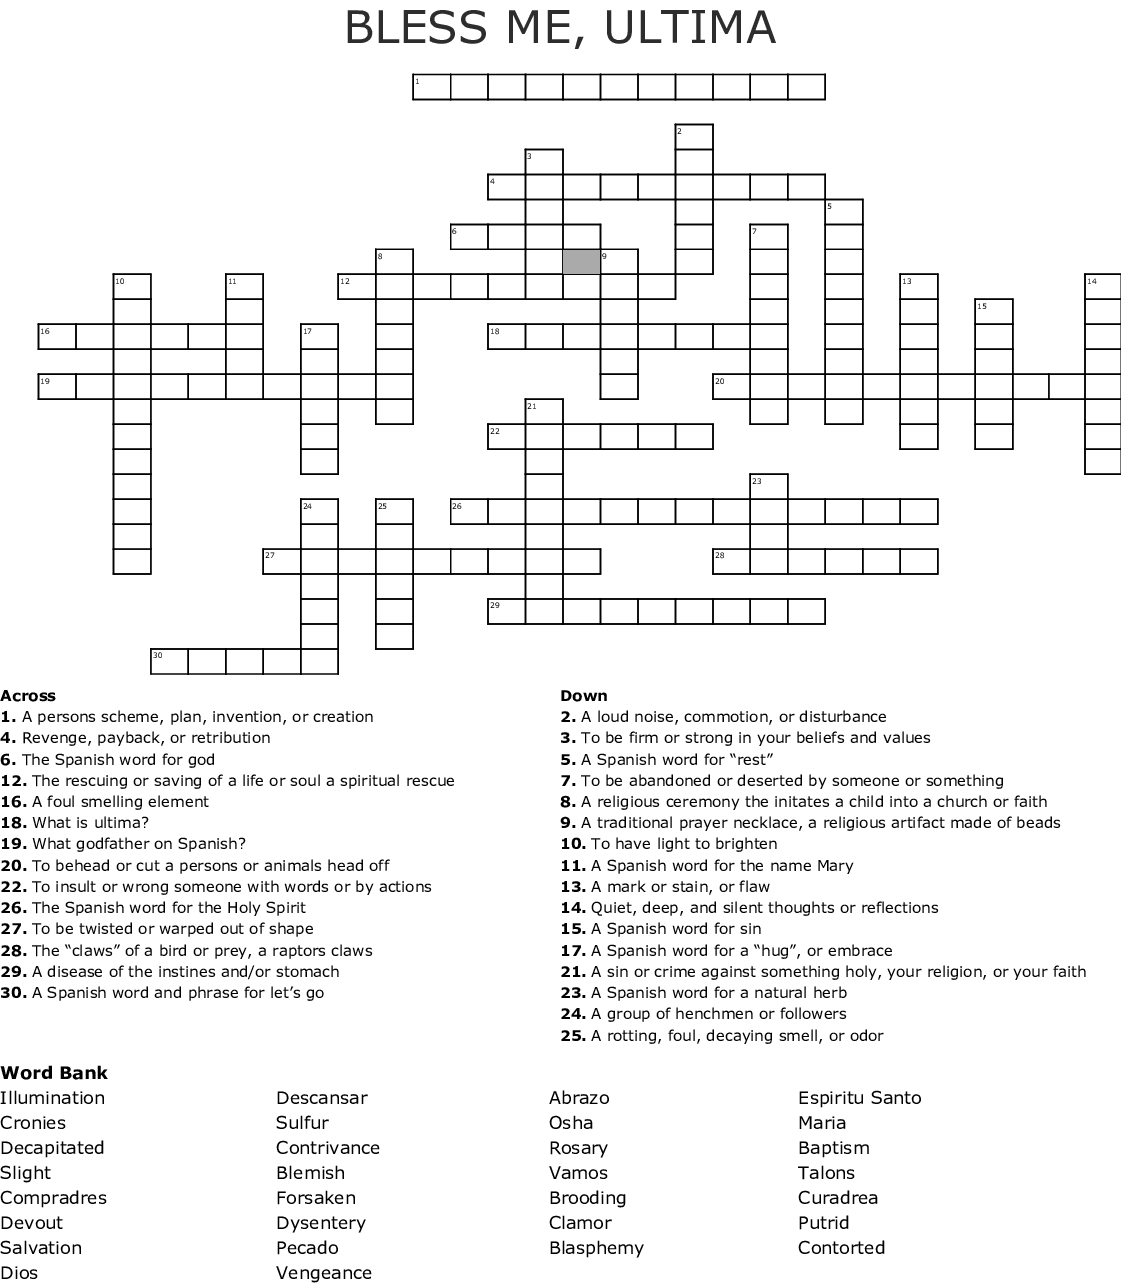 Bless Me Ultima Crossword